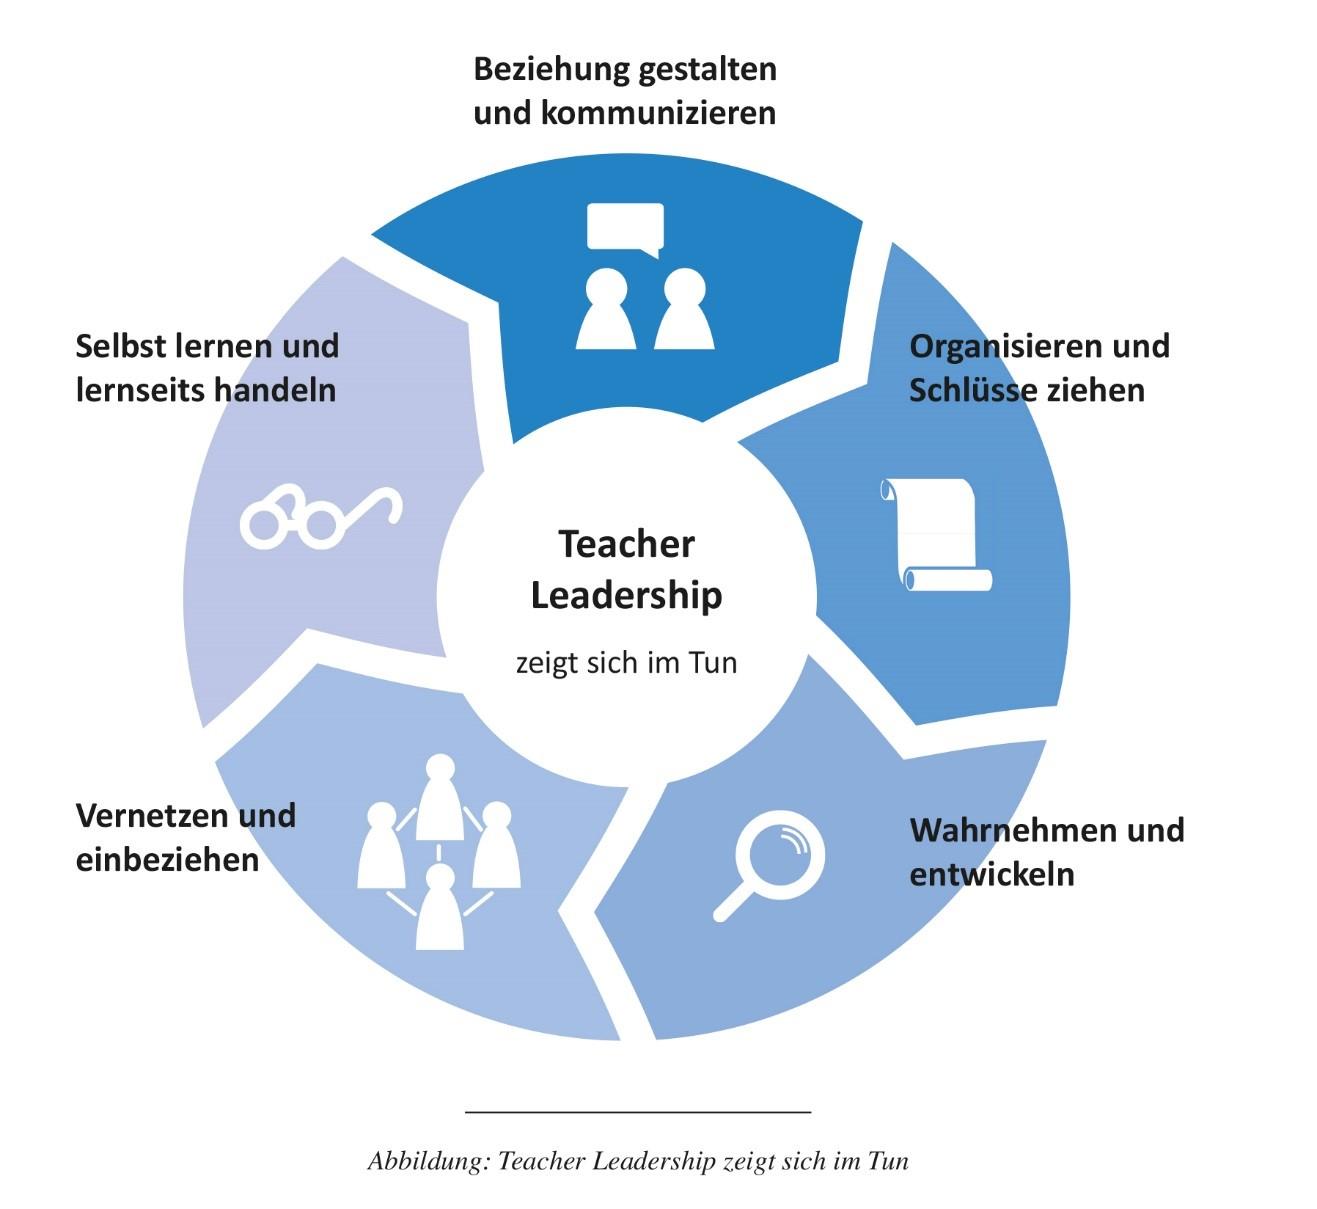 Abb. Teacher Leadership zeigt sich im Tun